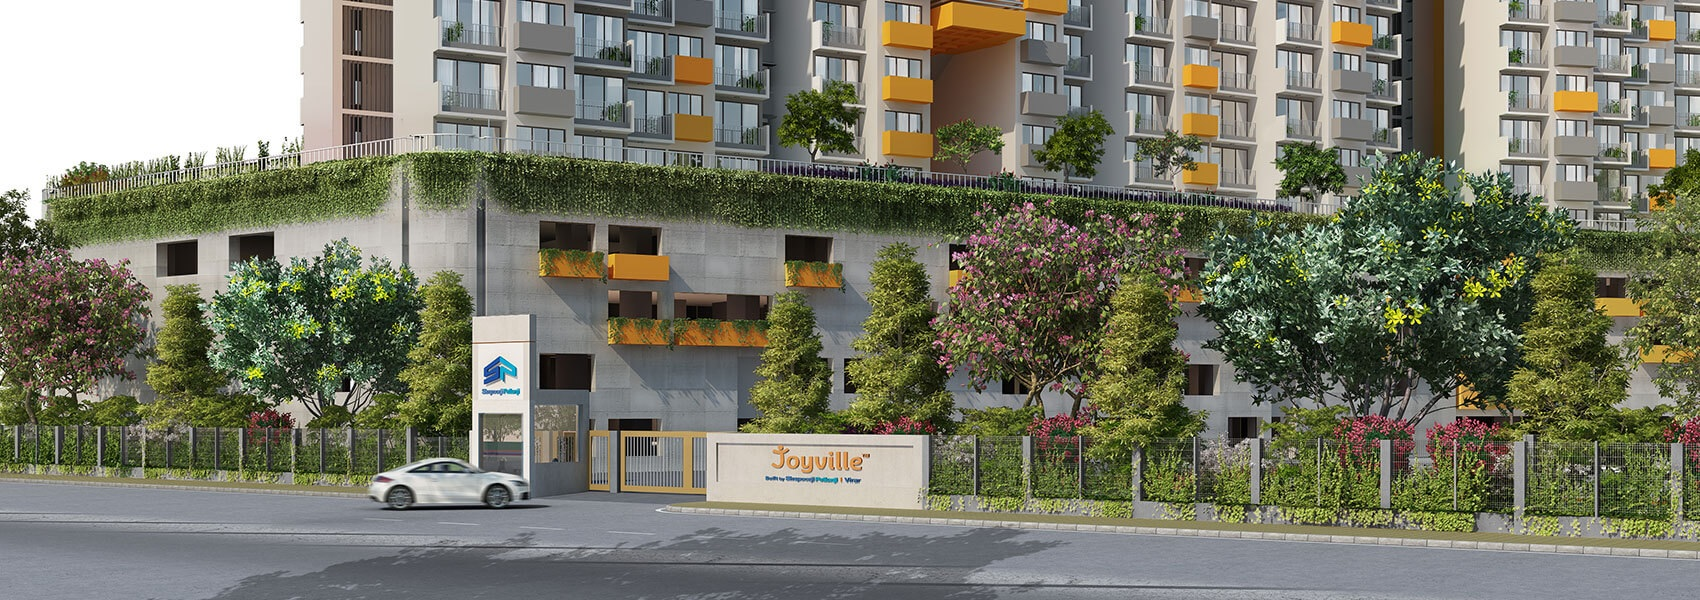 shapoorji pallonji joyville virar phase 5 entrance view8